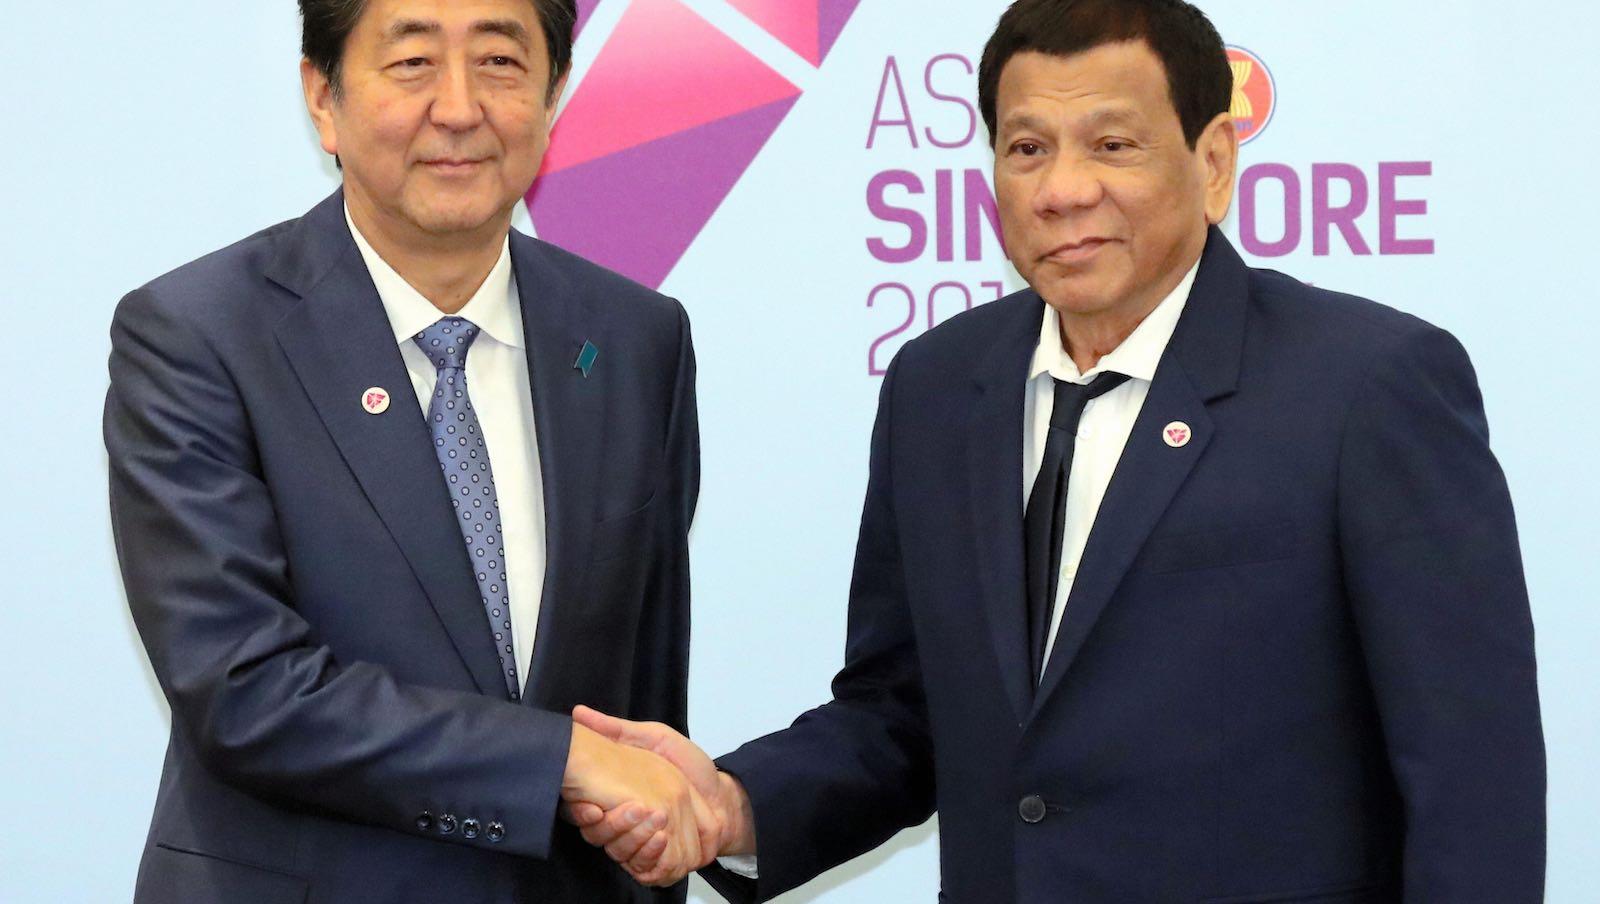 """Closer than brothers"": Japan's Shinzo Abe and Philippine President Rodrigo Duterte in November 2018 (Photo: Asahi Shimbun via Getty)"